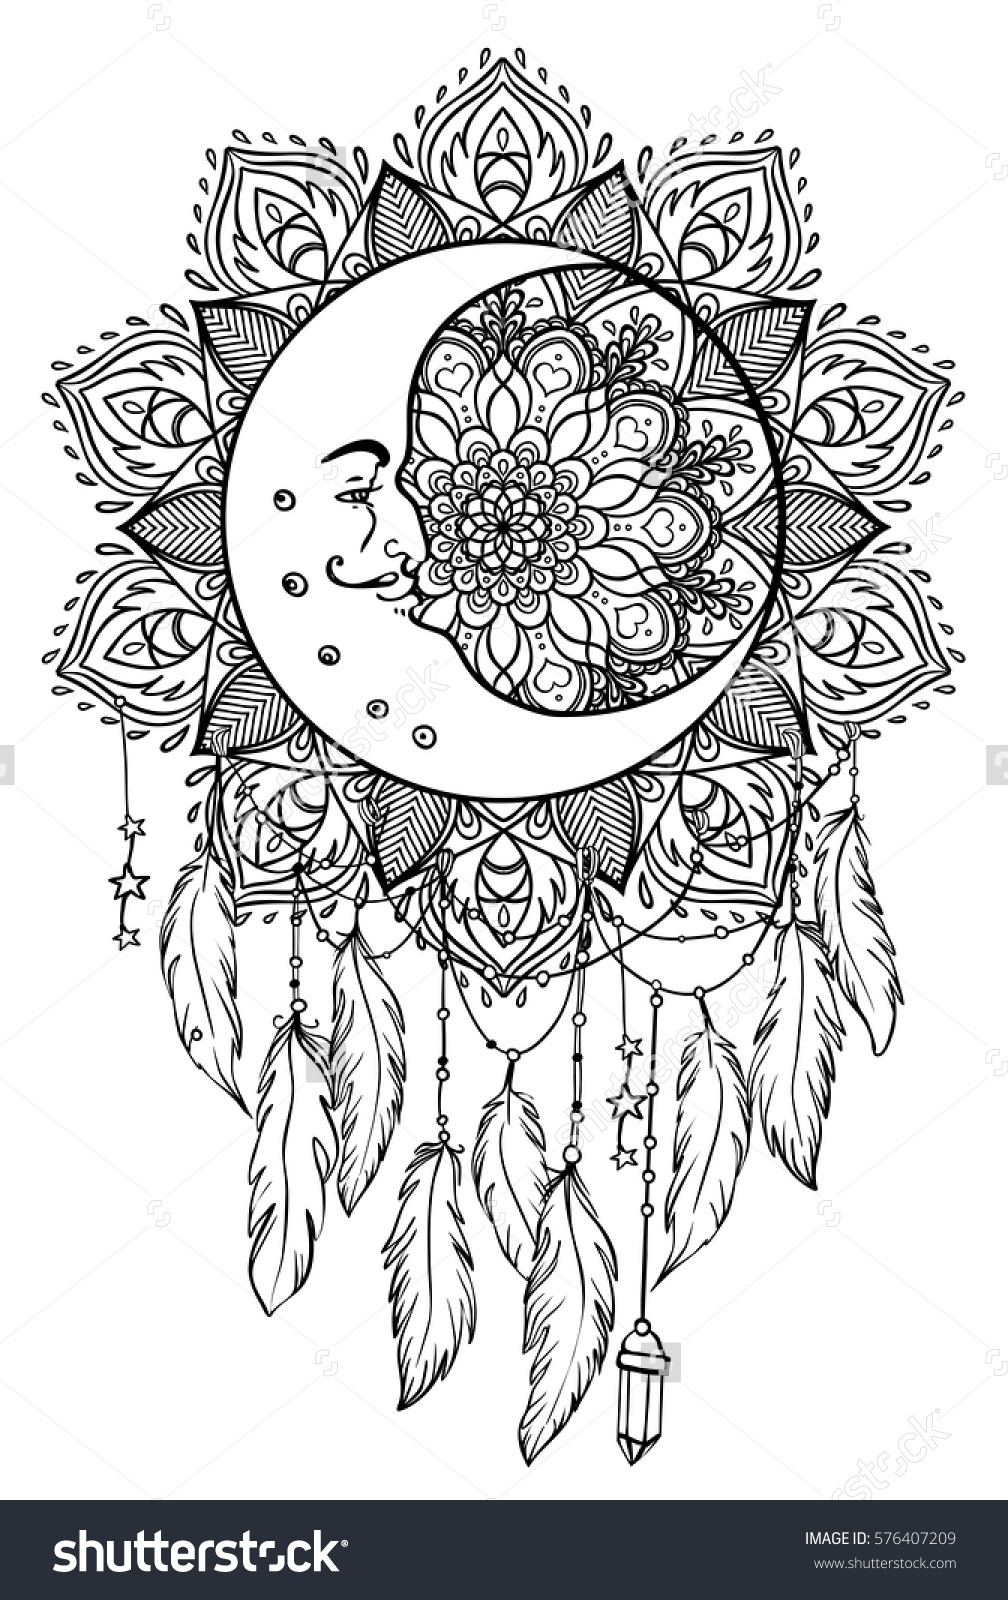 Talisman coloring #14, Download drawings